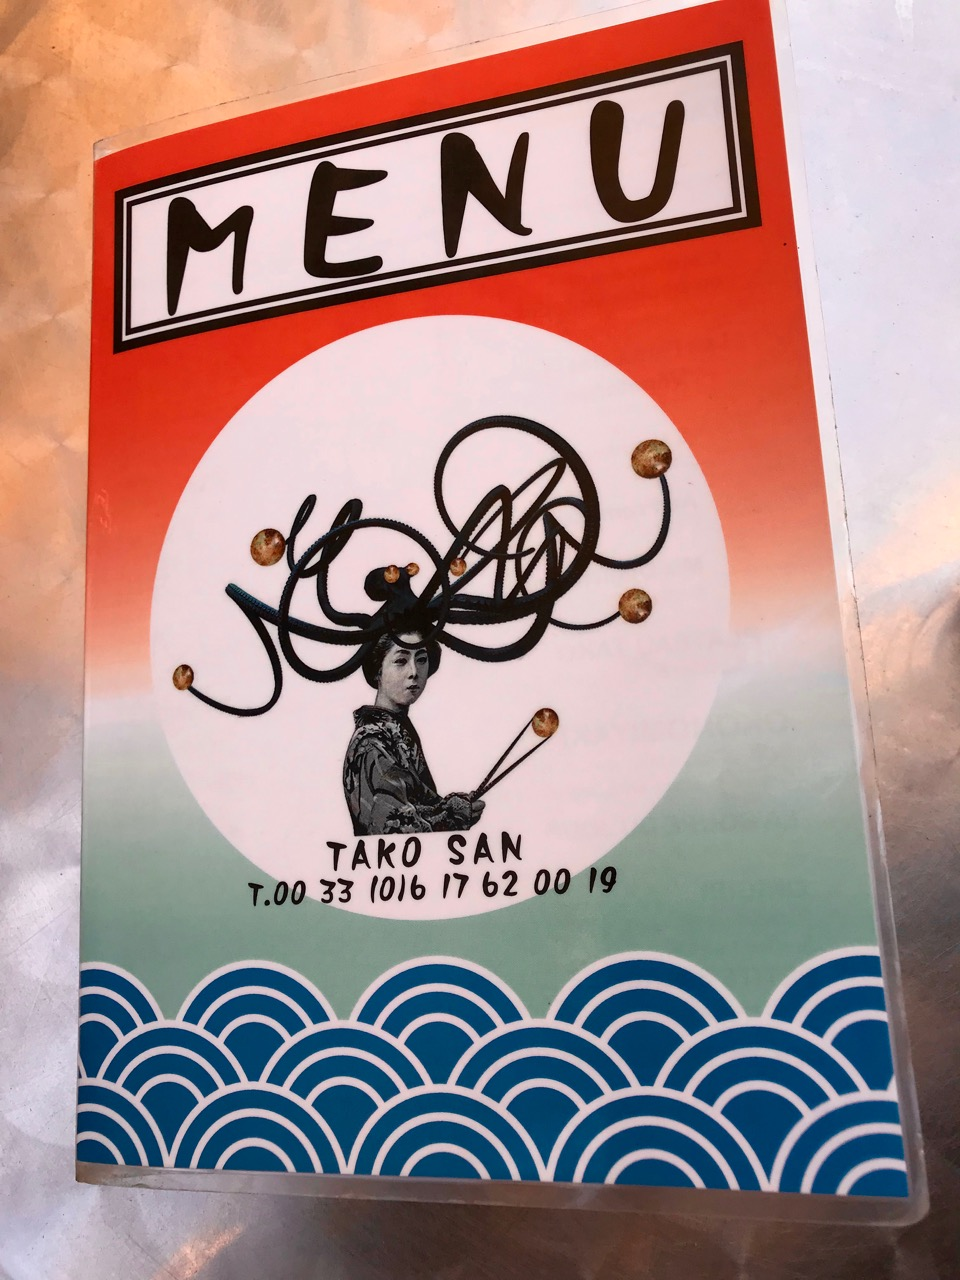 marseille-takosan-menu